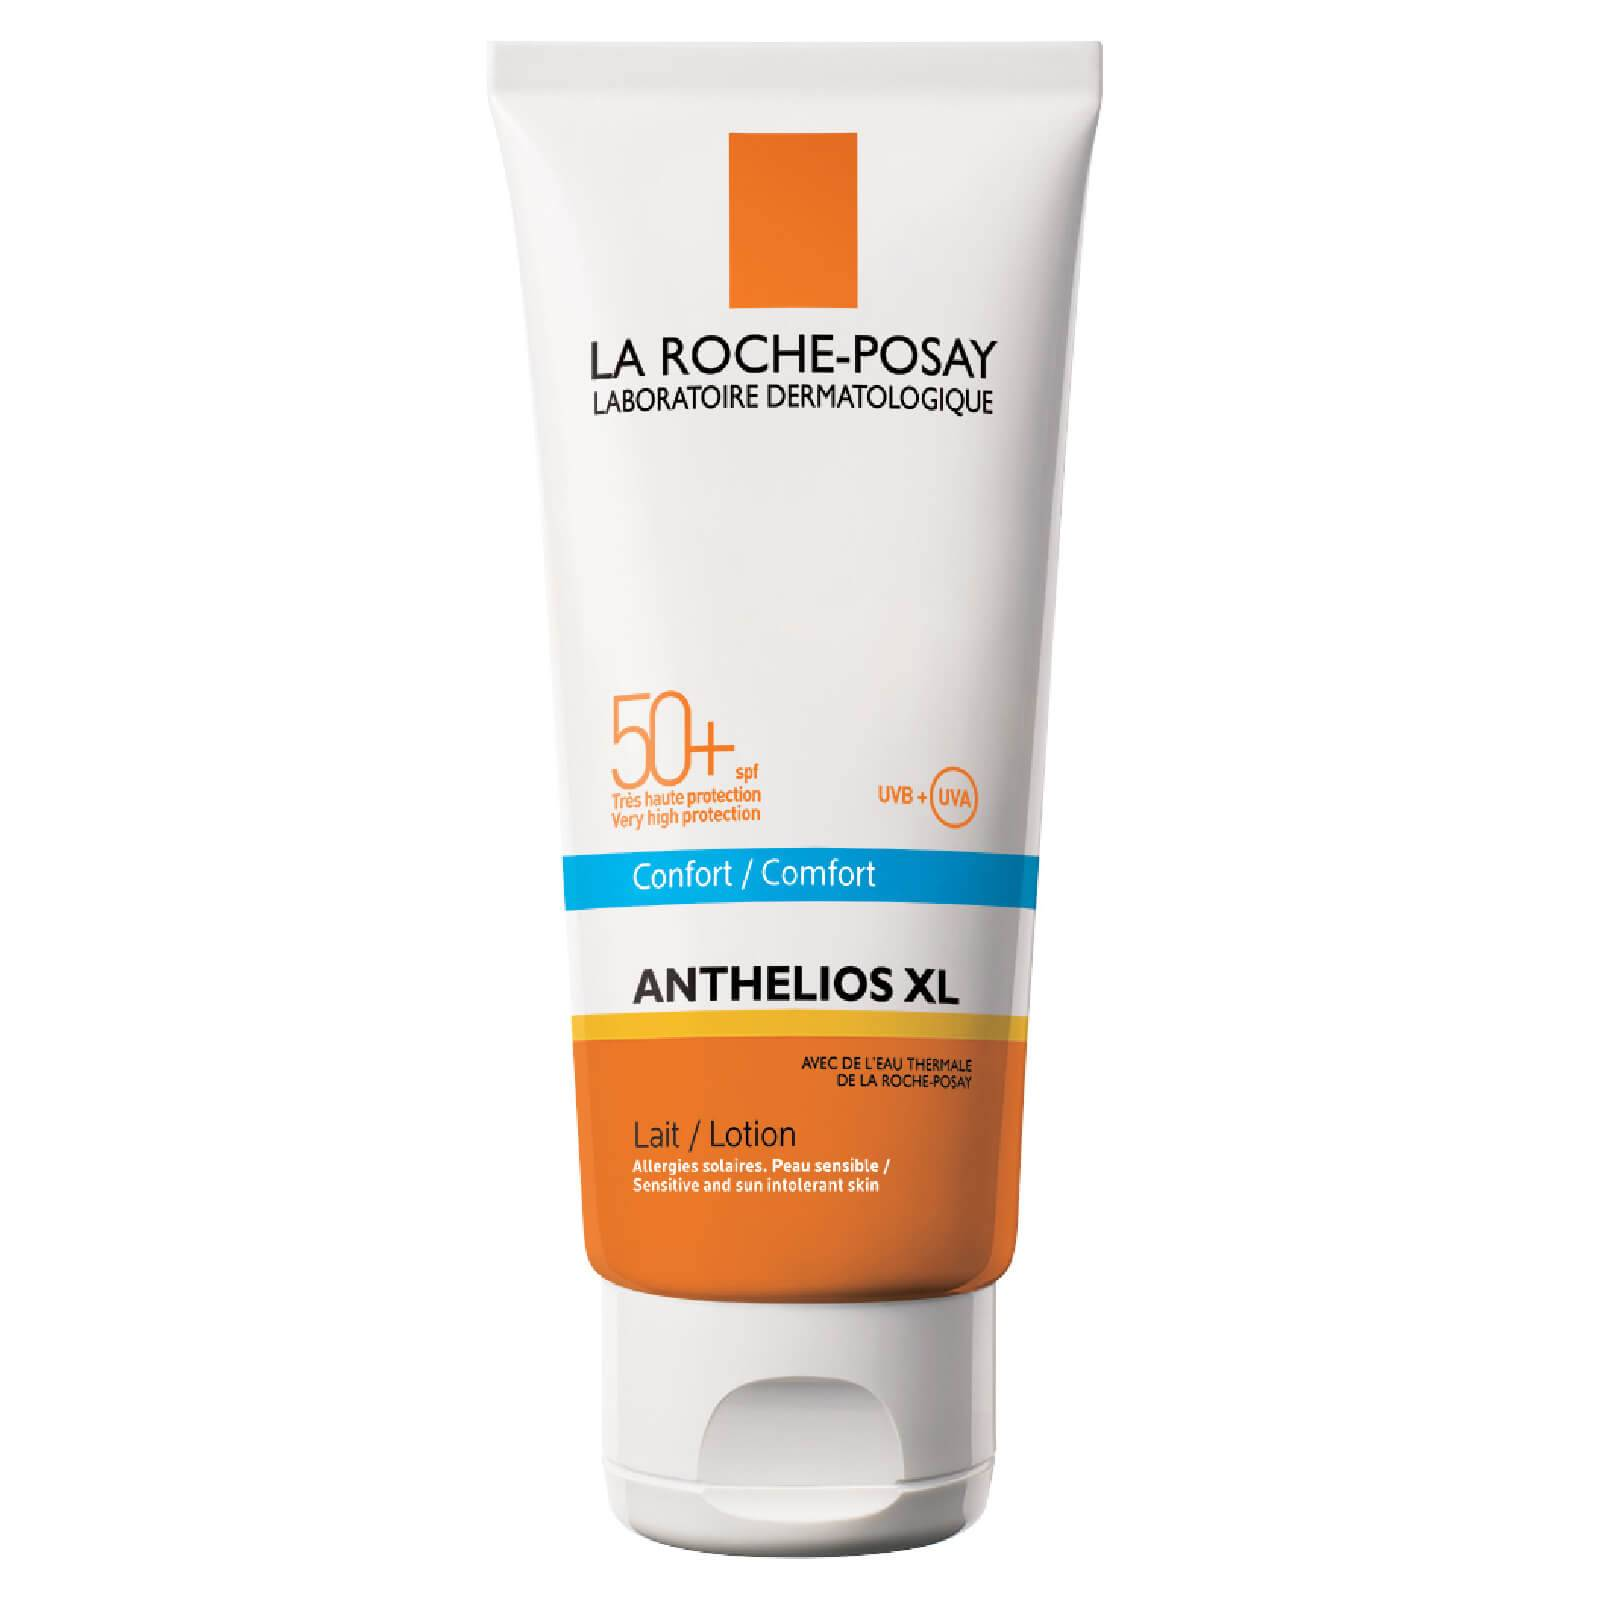 La Roche-Posay Lait Solaire Anthélios SPF 50+ 100 ml La Roche-Posay